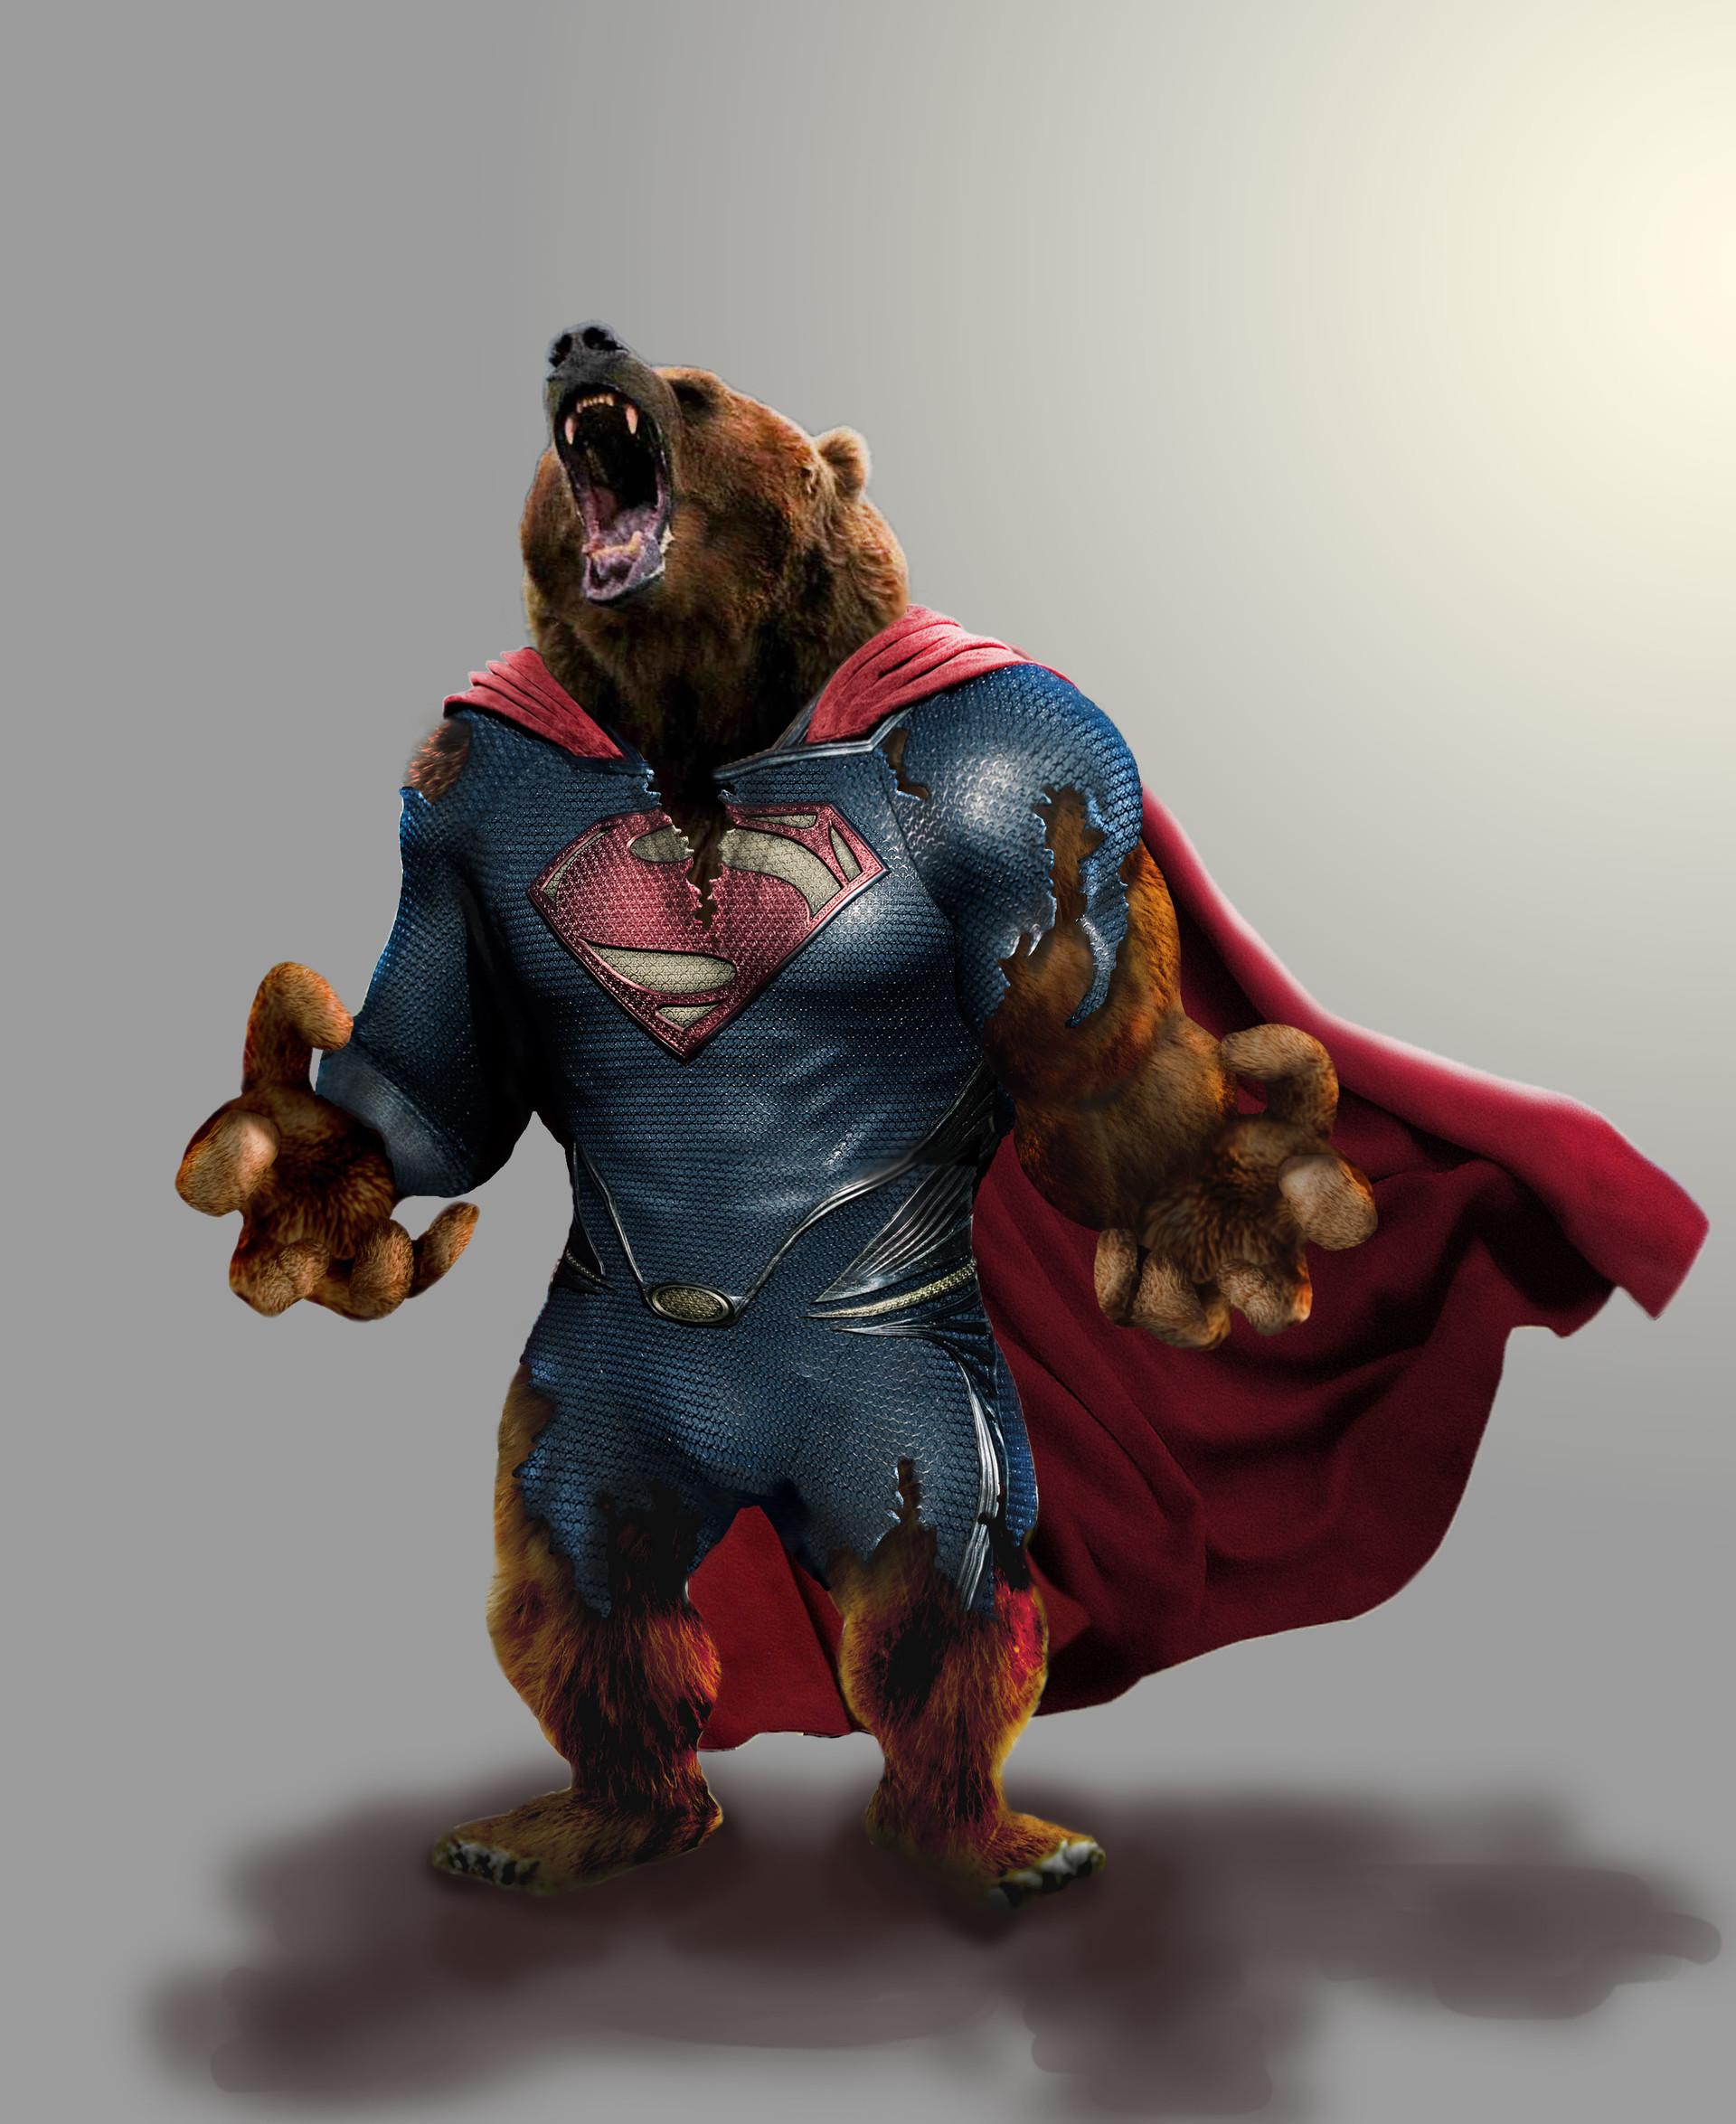 Micah peterson superbear